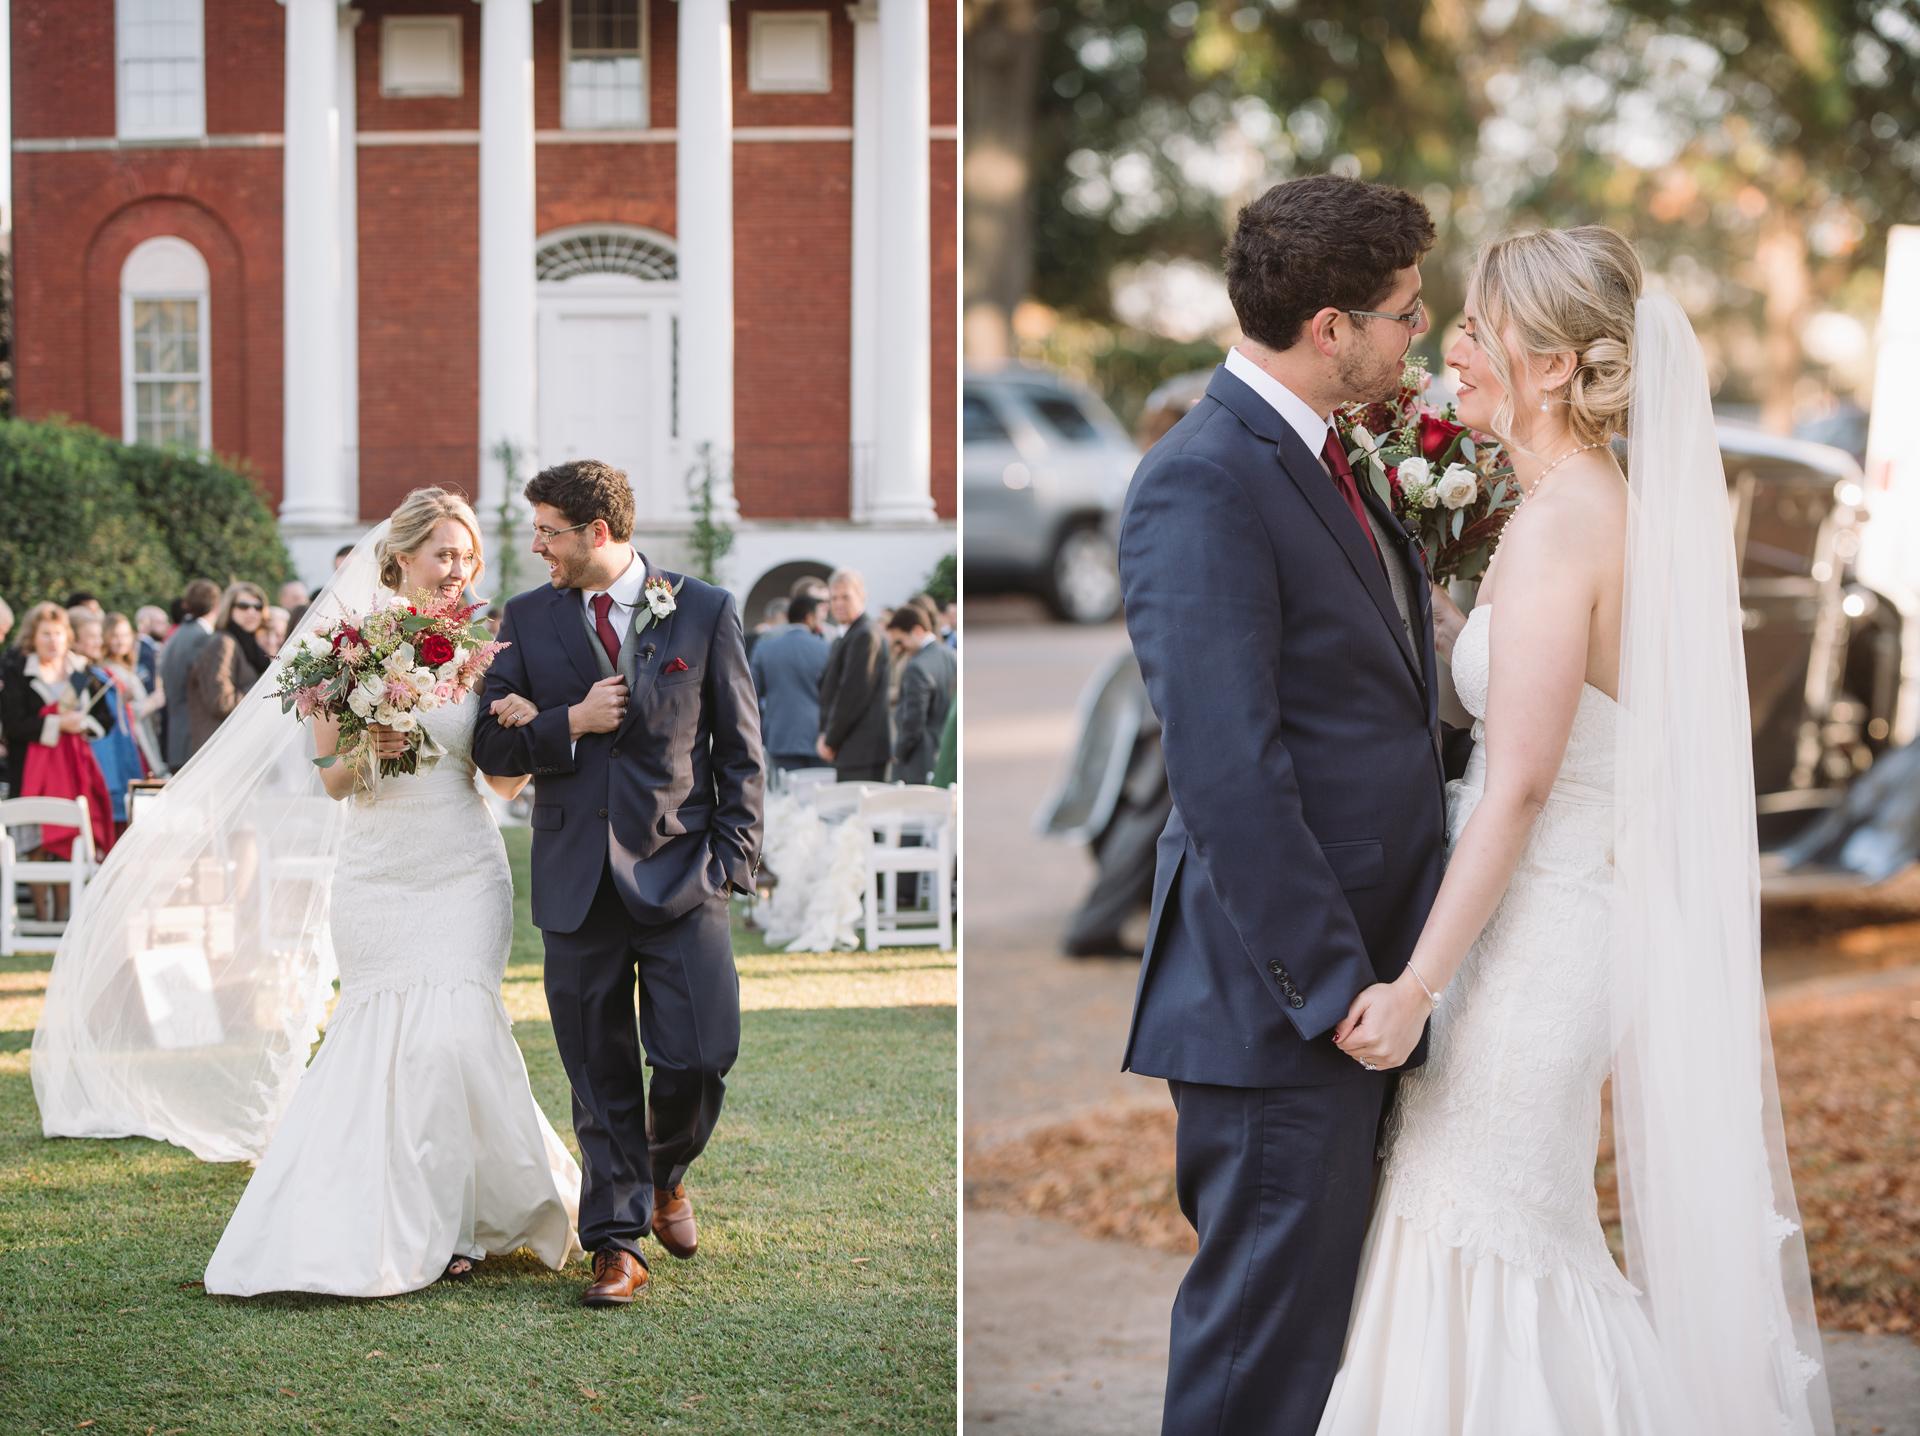 cute wedding ceremony